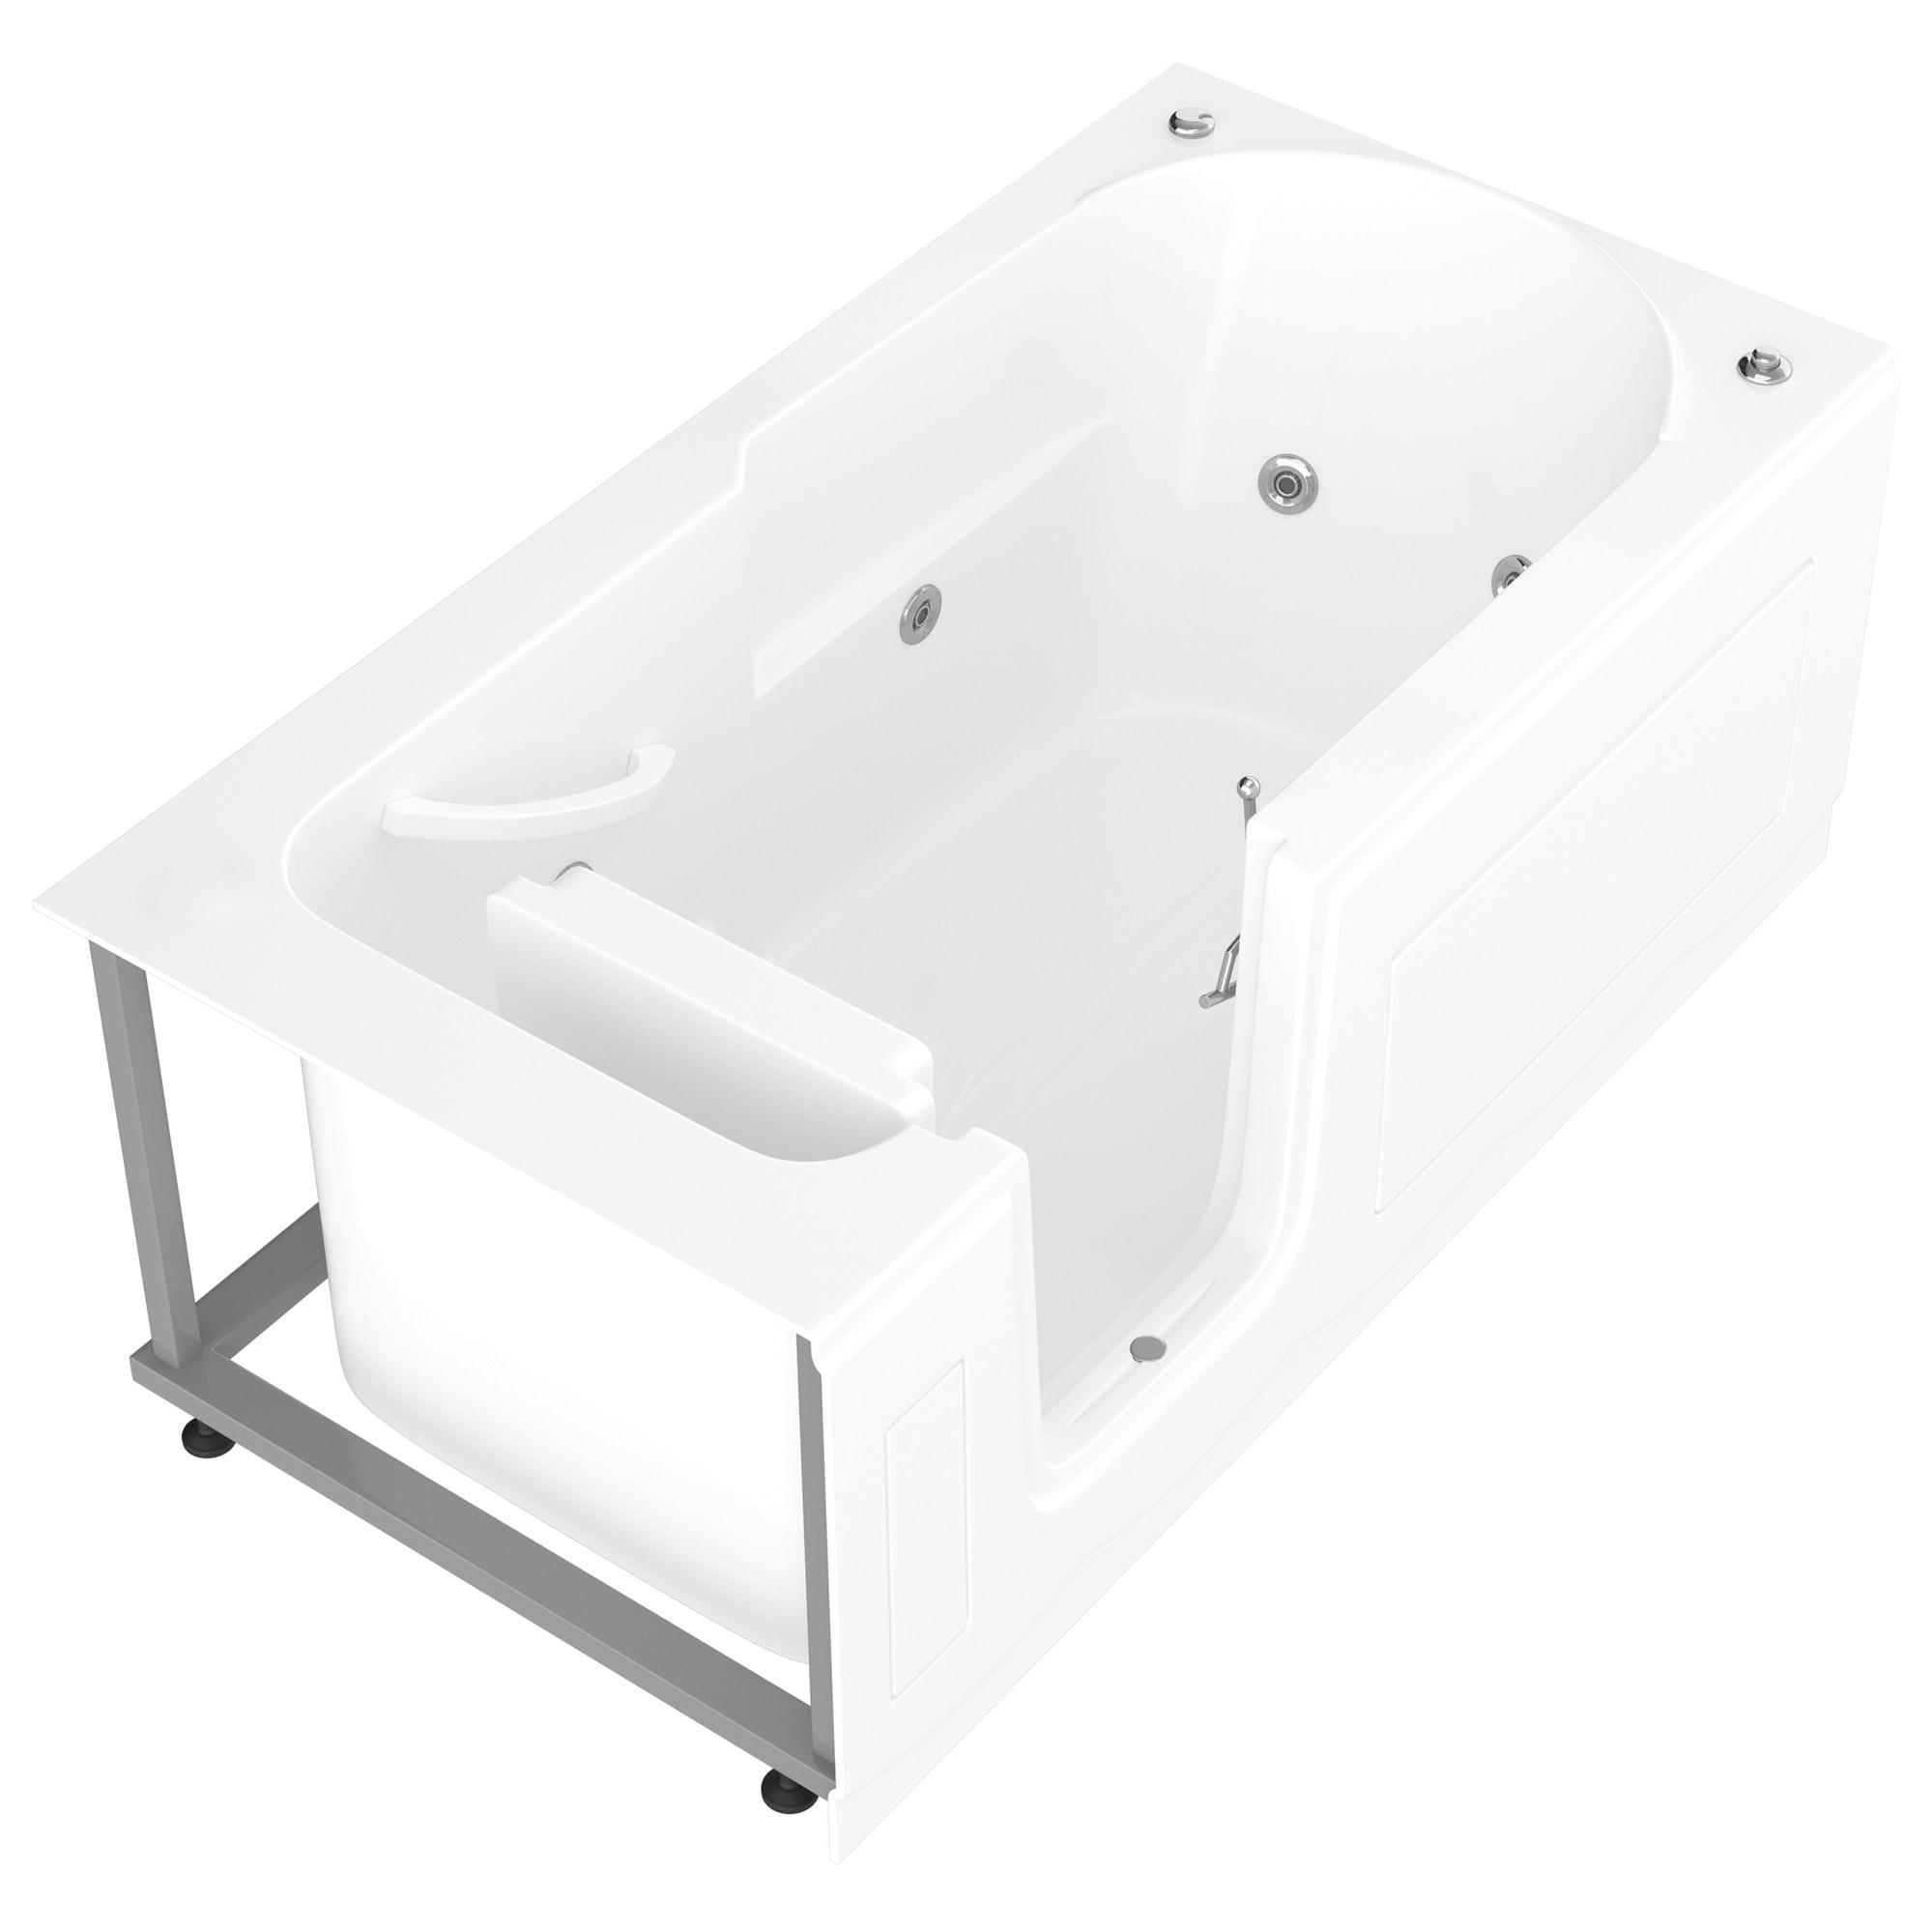 Meditub Step-In 30x60-inch Left Drain White Whirlpool Jet...